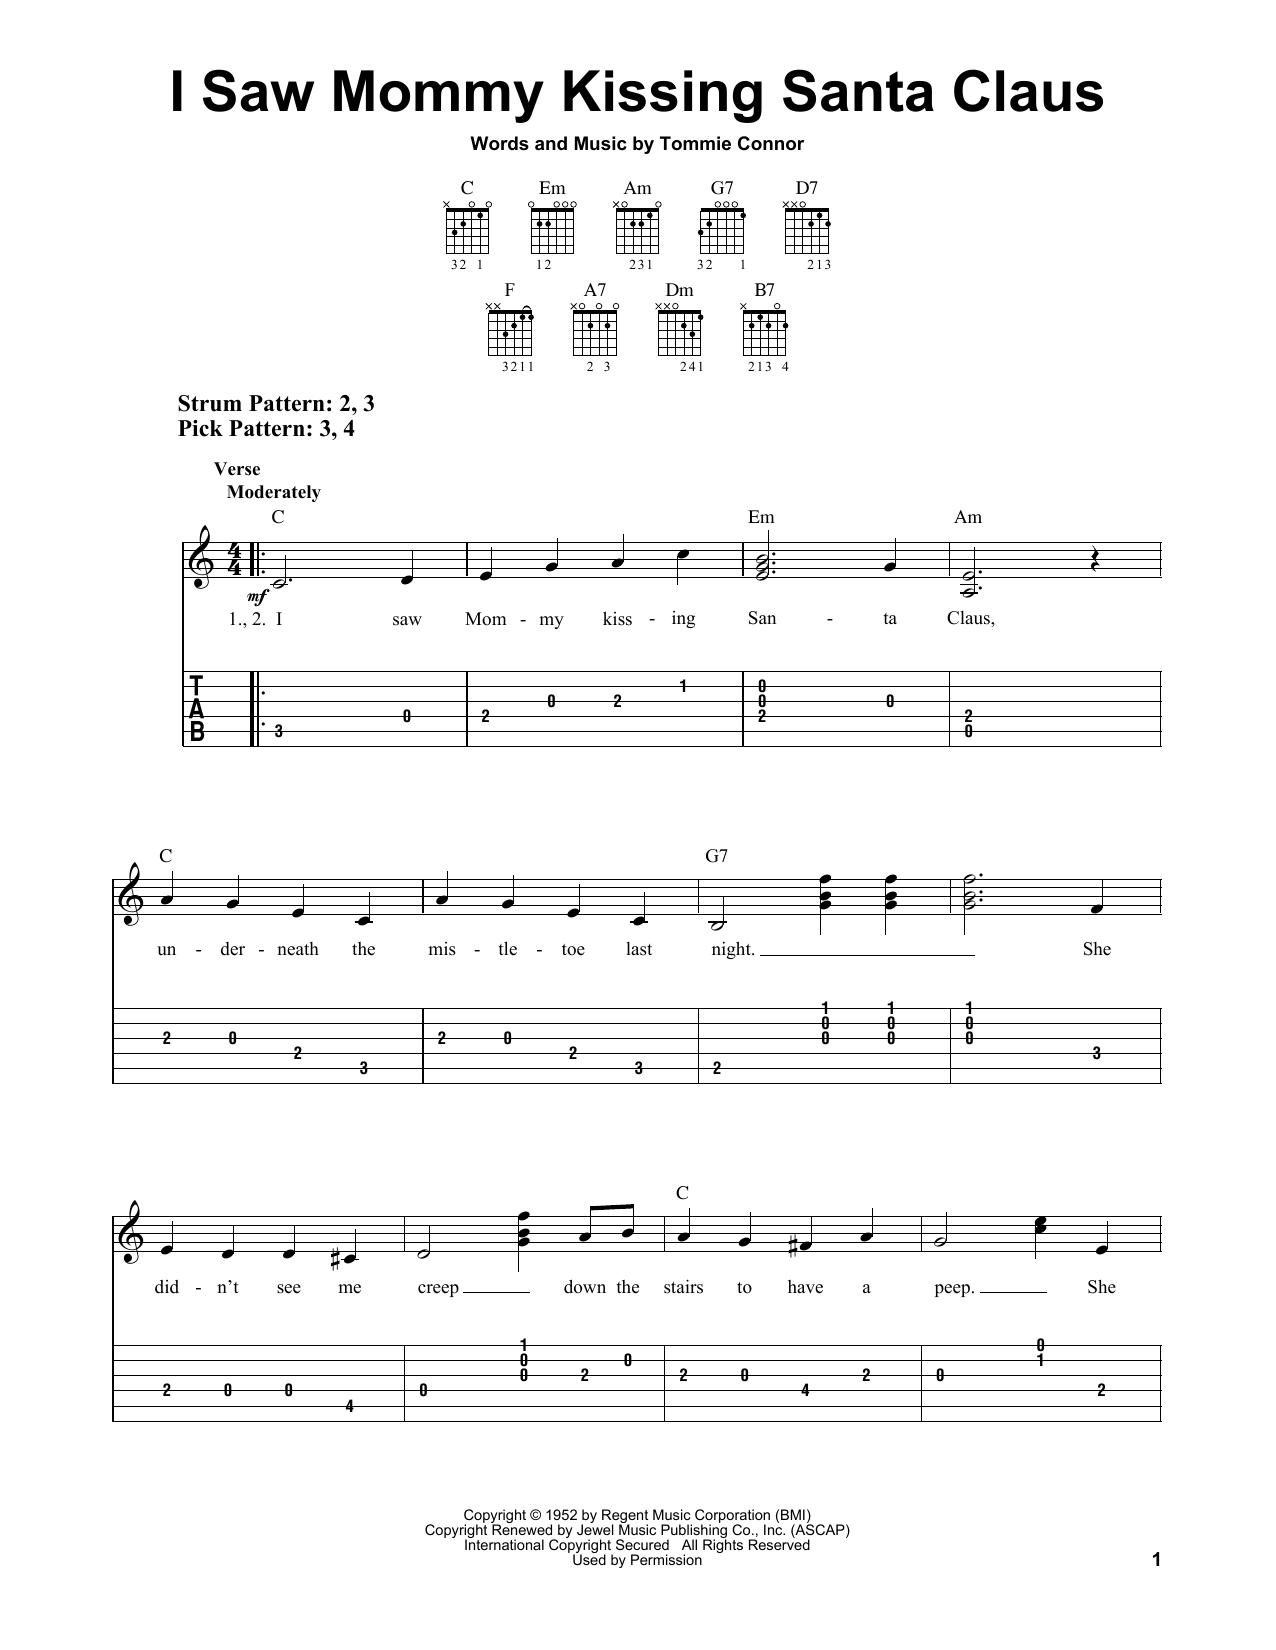 Tablature guitare I Saw Mommy Kissing Santa Claus de Tommie Connor - Tablature guitare facile